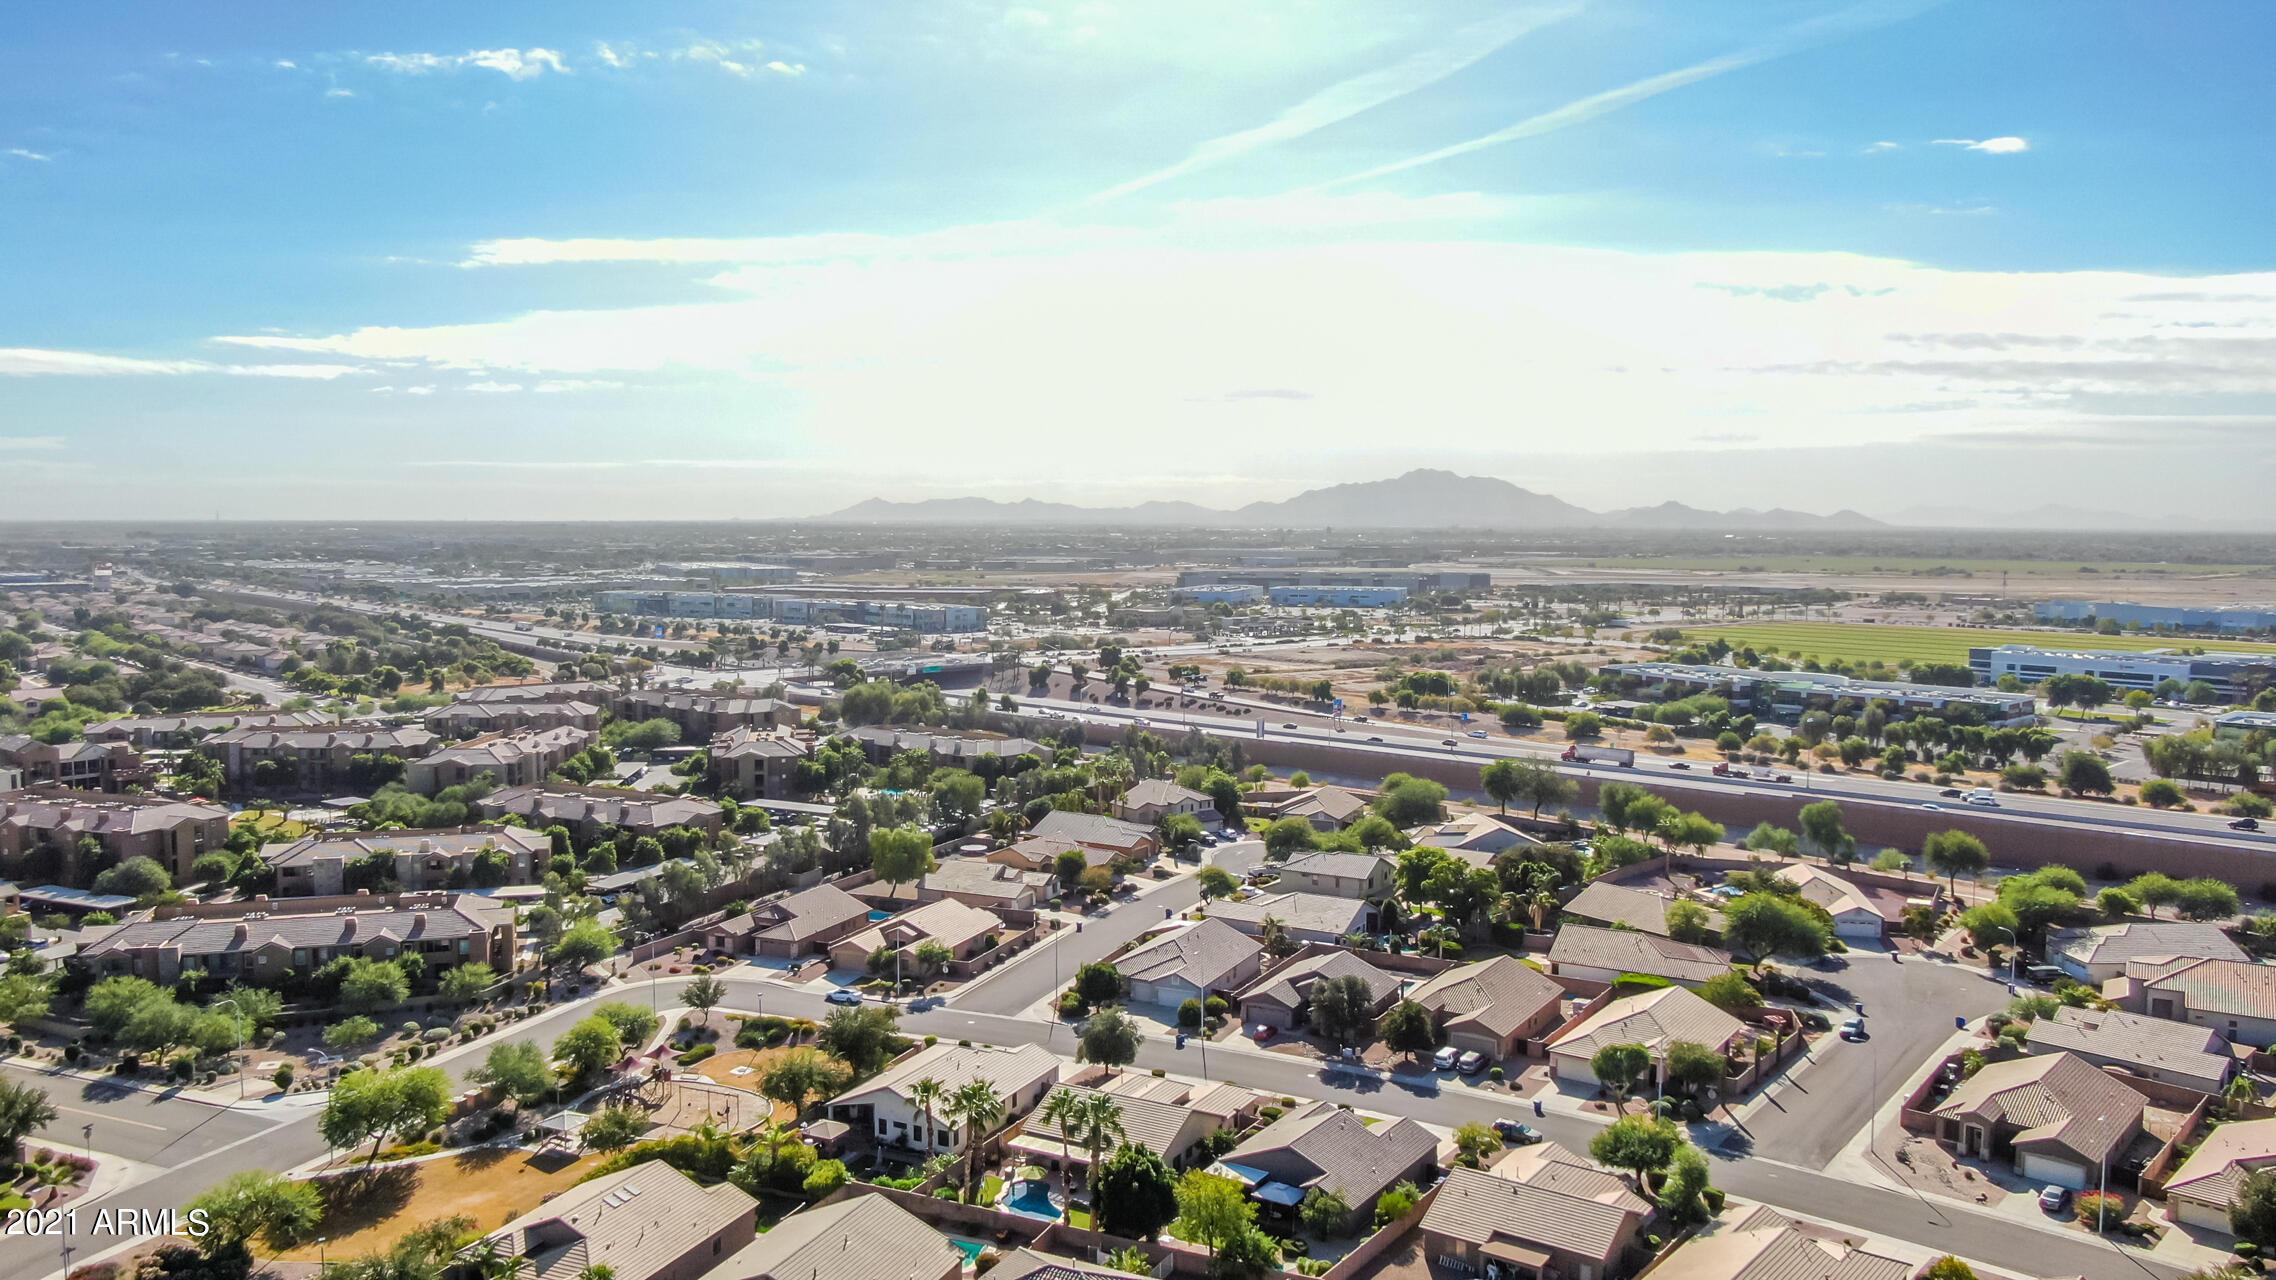 MLS 6310200 1772 E Wildhorse Place, Chandler, AZ 85286 Chandler AZ Canyon Oaks Estates